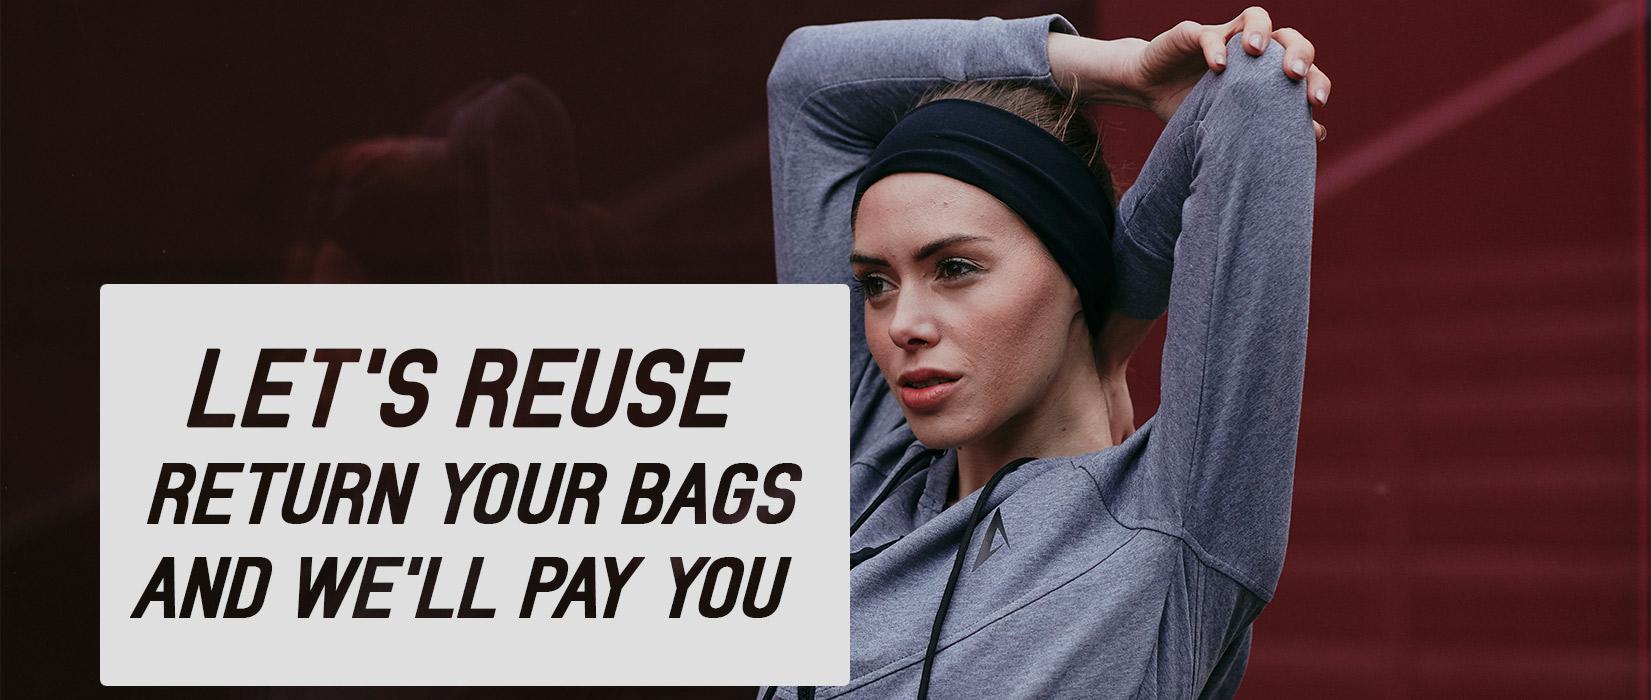 Return your bag scheme